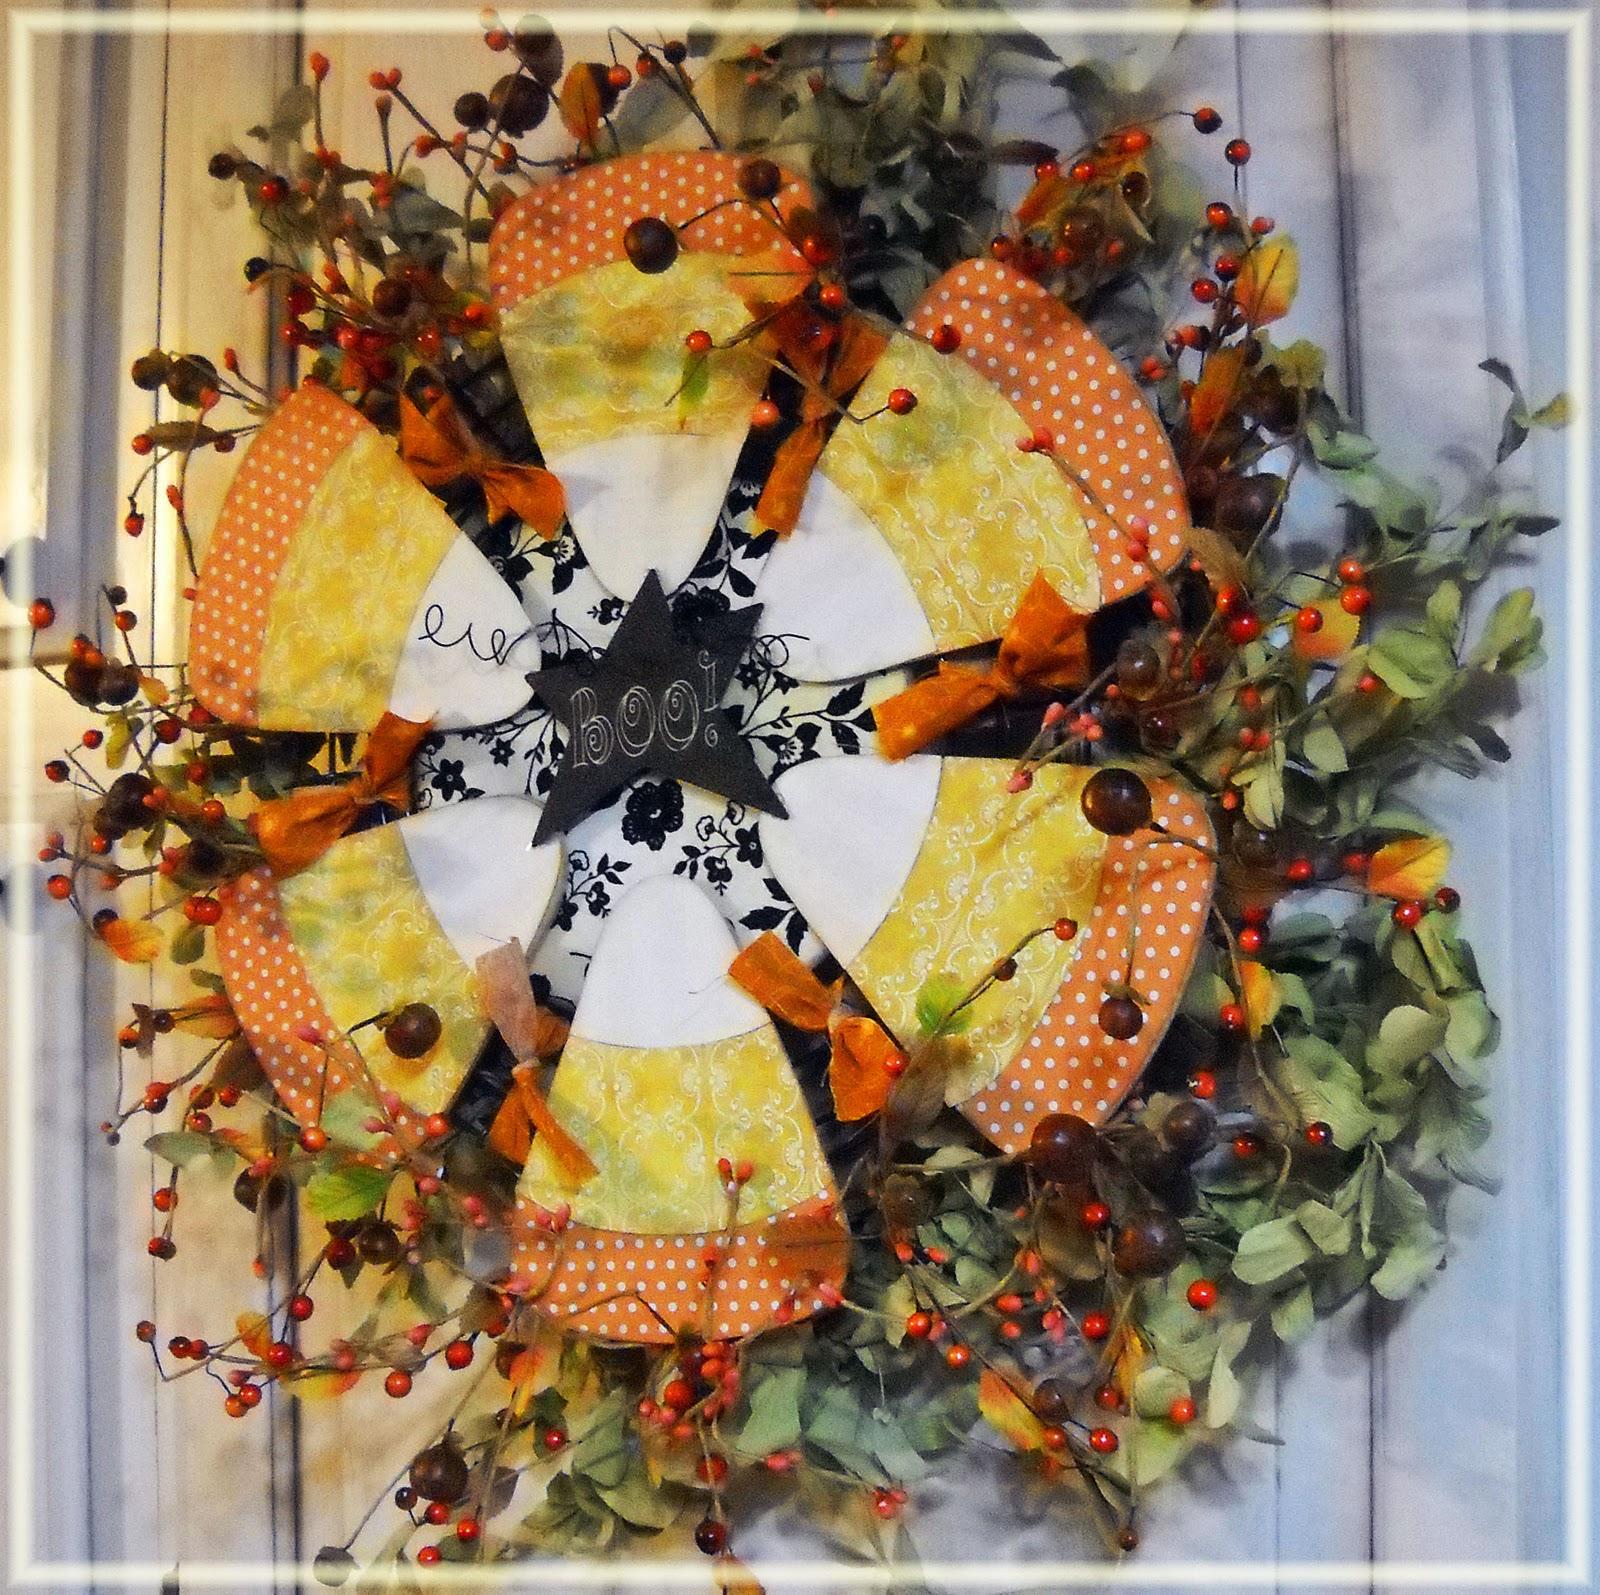 http://i1.wp.com/1.bp.blogspot.com/_9rabKGbJaLY/TKobkjF9ljI/AAAAAAAABLk/Fd60nmOUT5I/s1600/candy-corn-wreath-7.jpg?resize=560%2C559